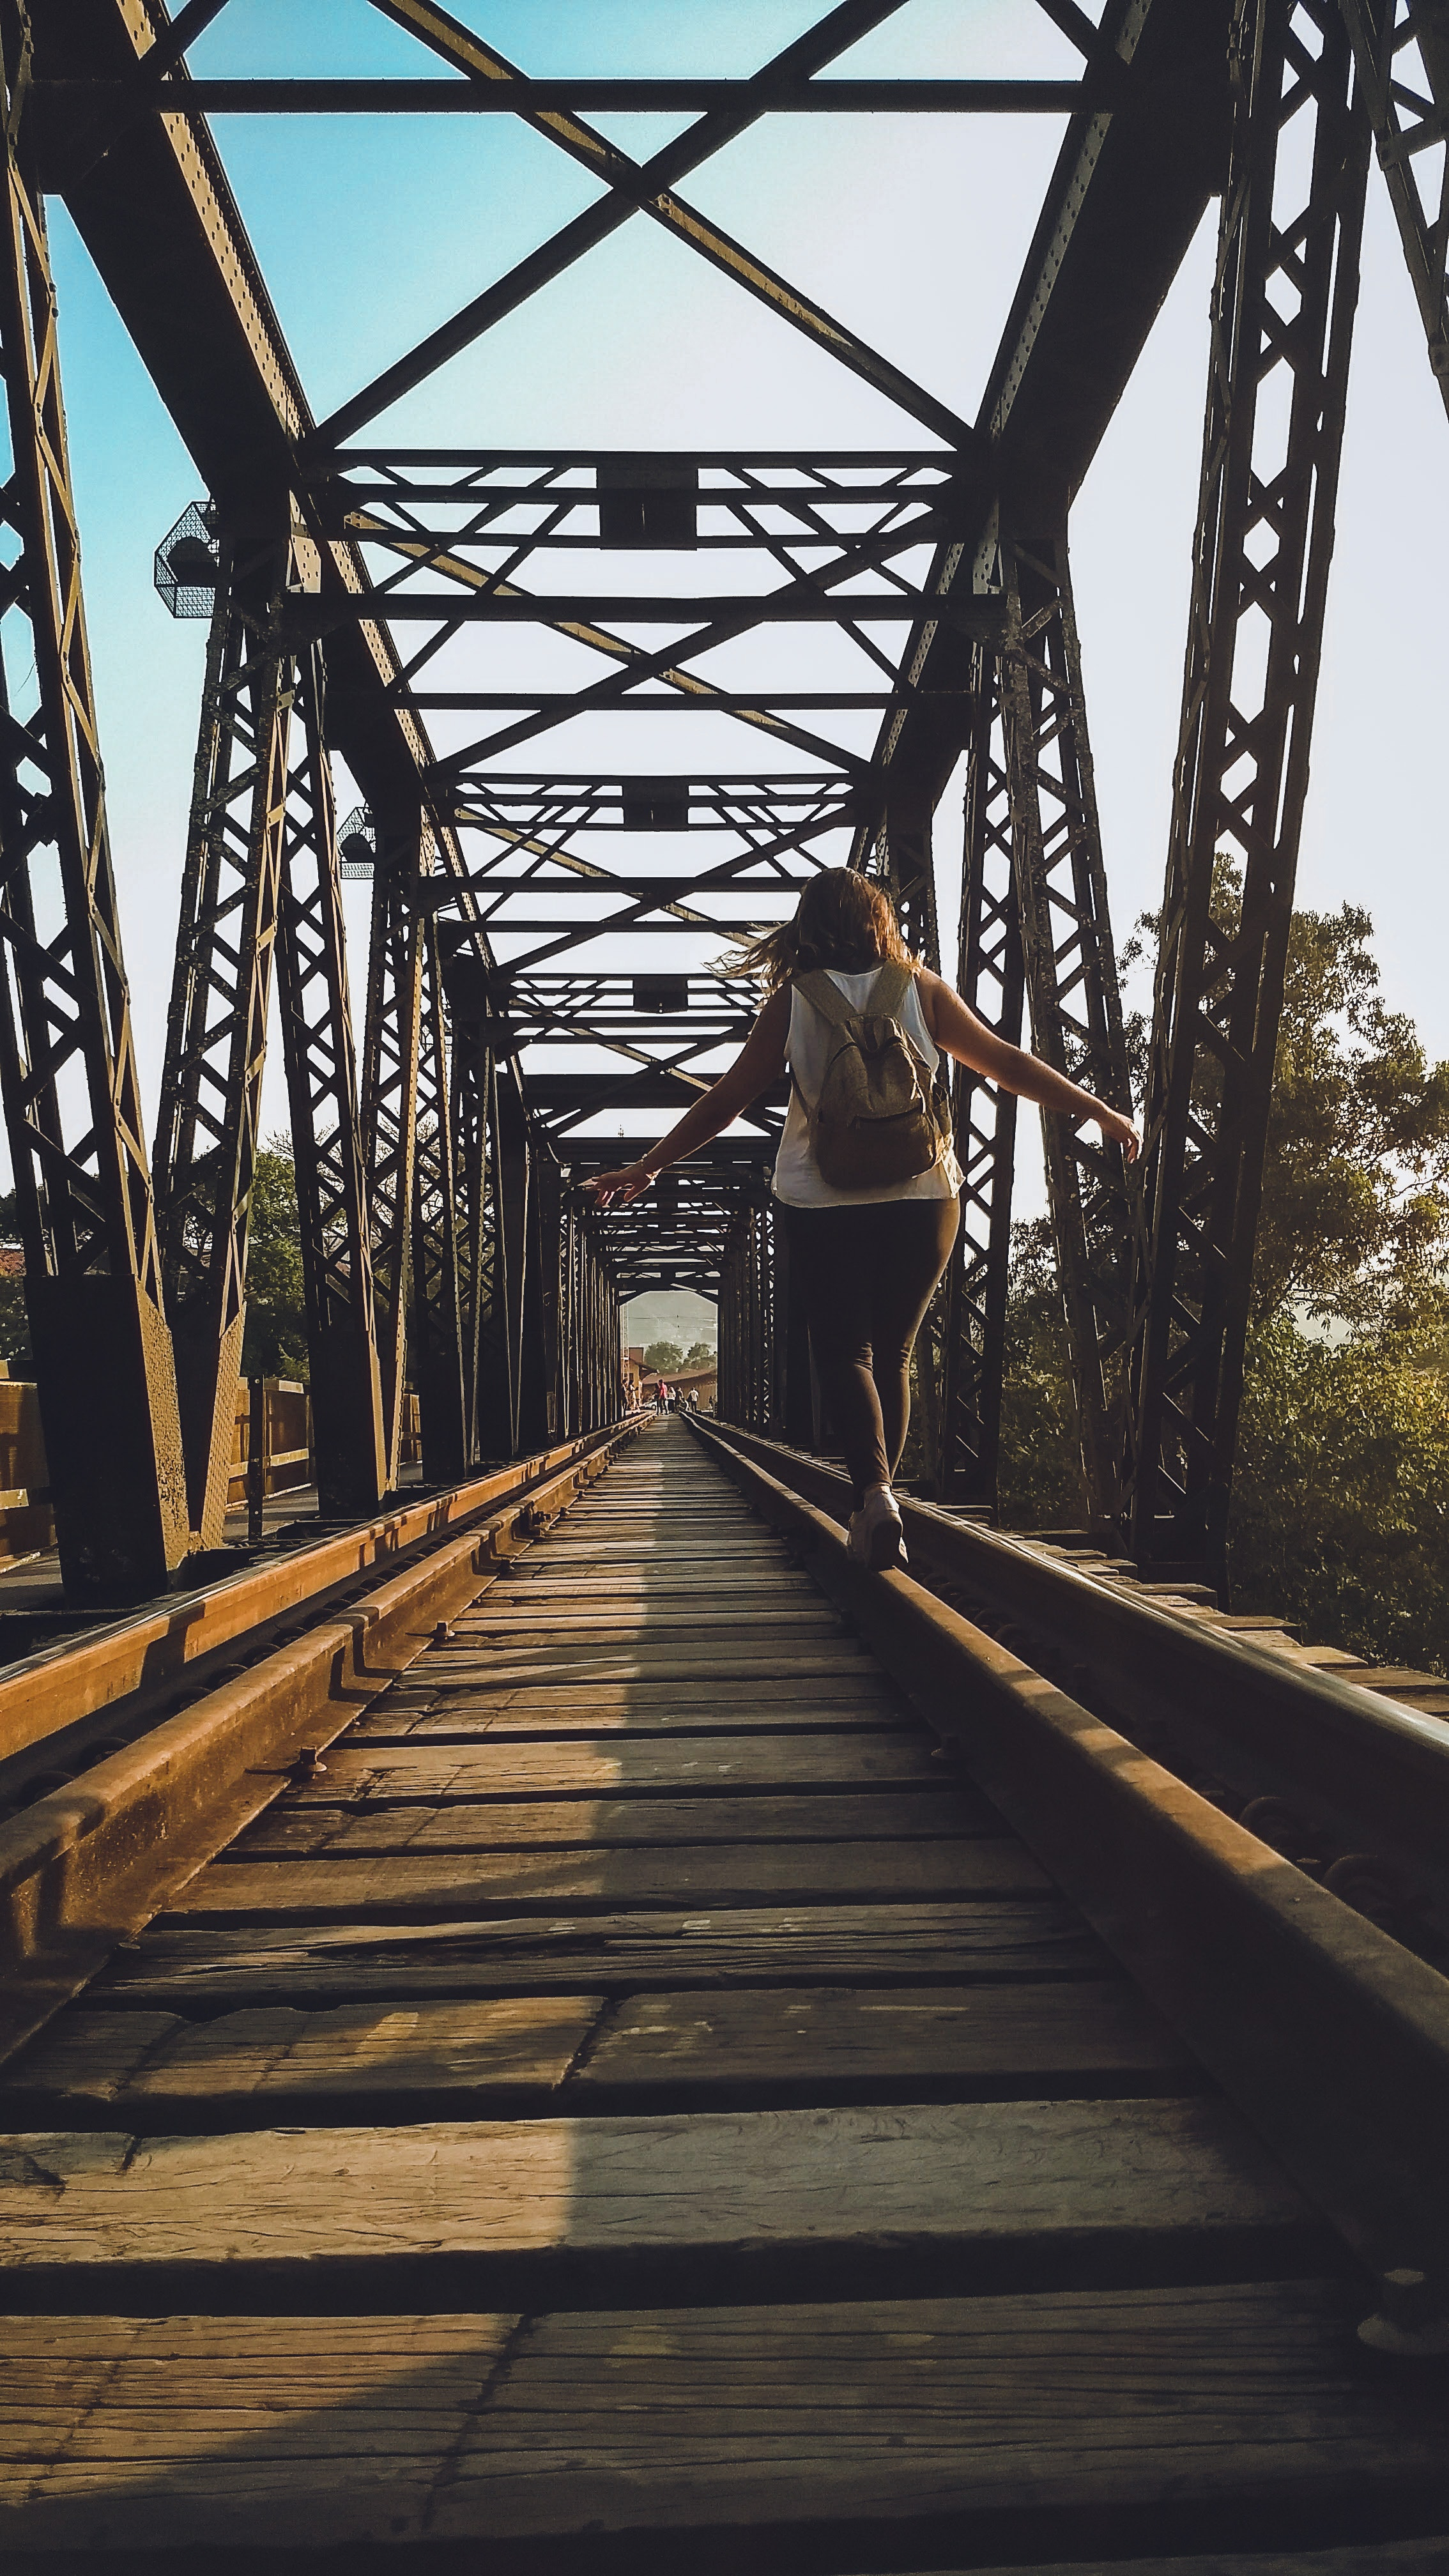 Woman walking on a train rail photo